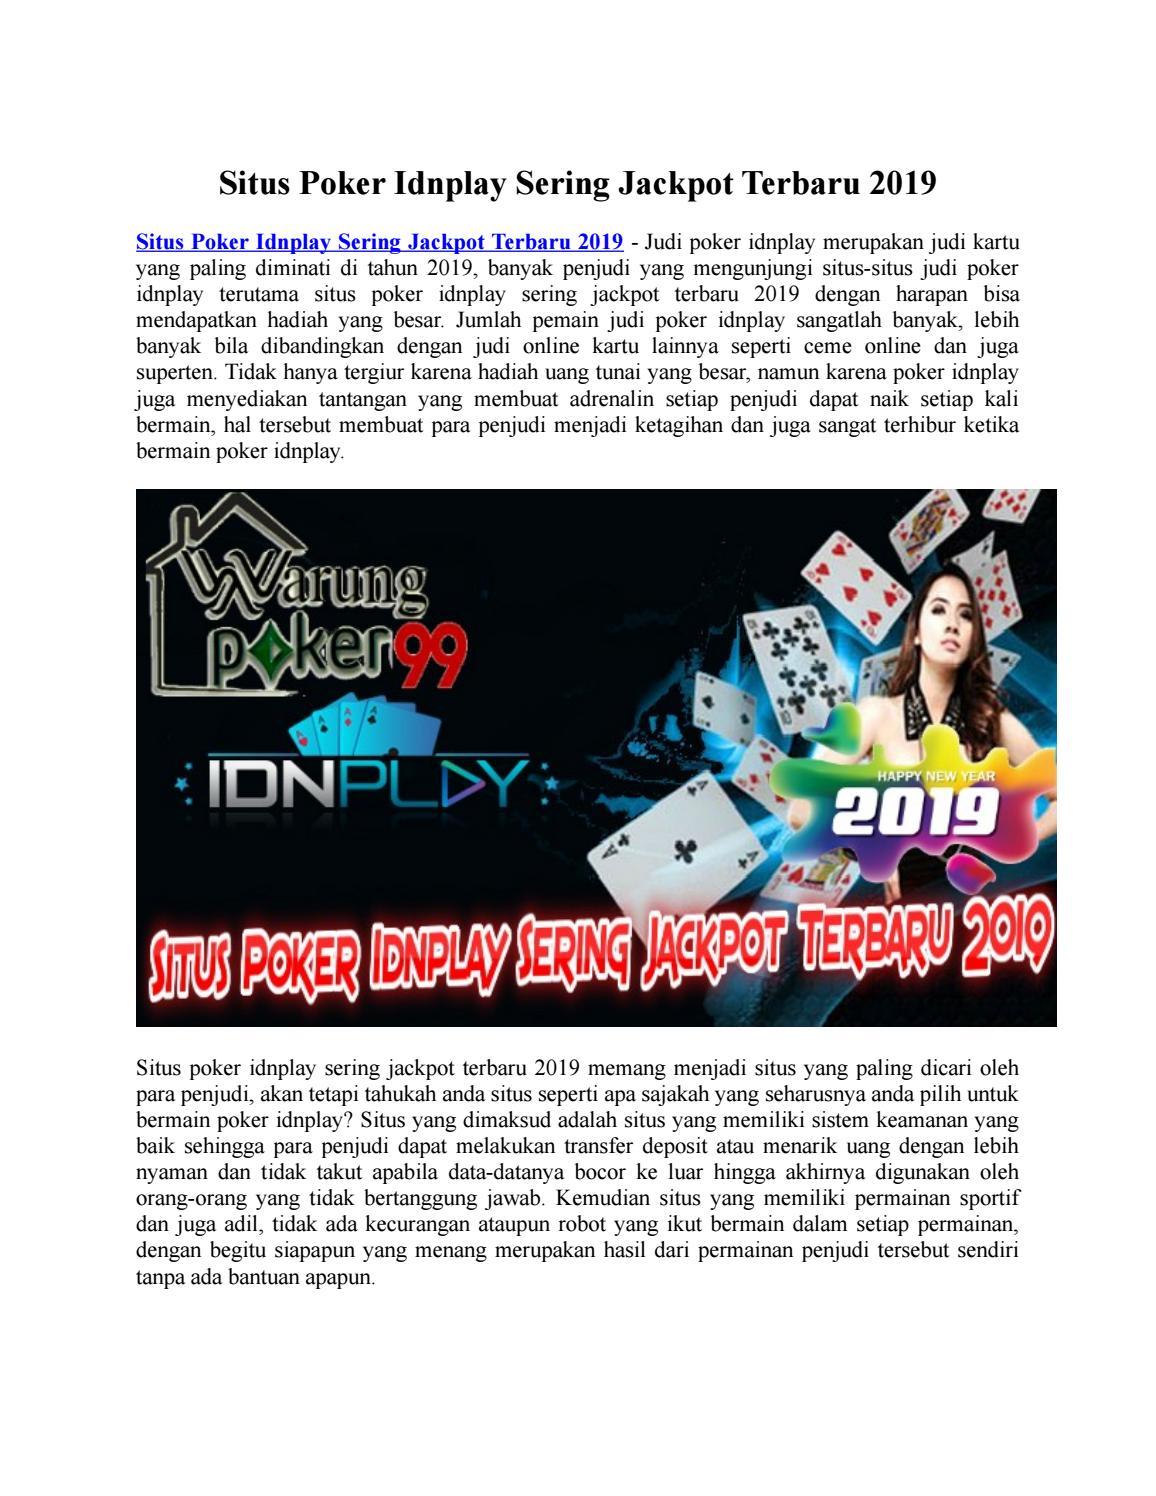 Situs Poker Idnplay Sering Jackpot Terbaru 2019 Dewa Qq By Dewapoker99 Situs Poker99 Server Idnplay Issuu